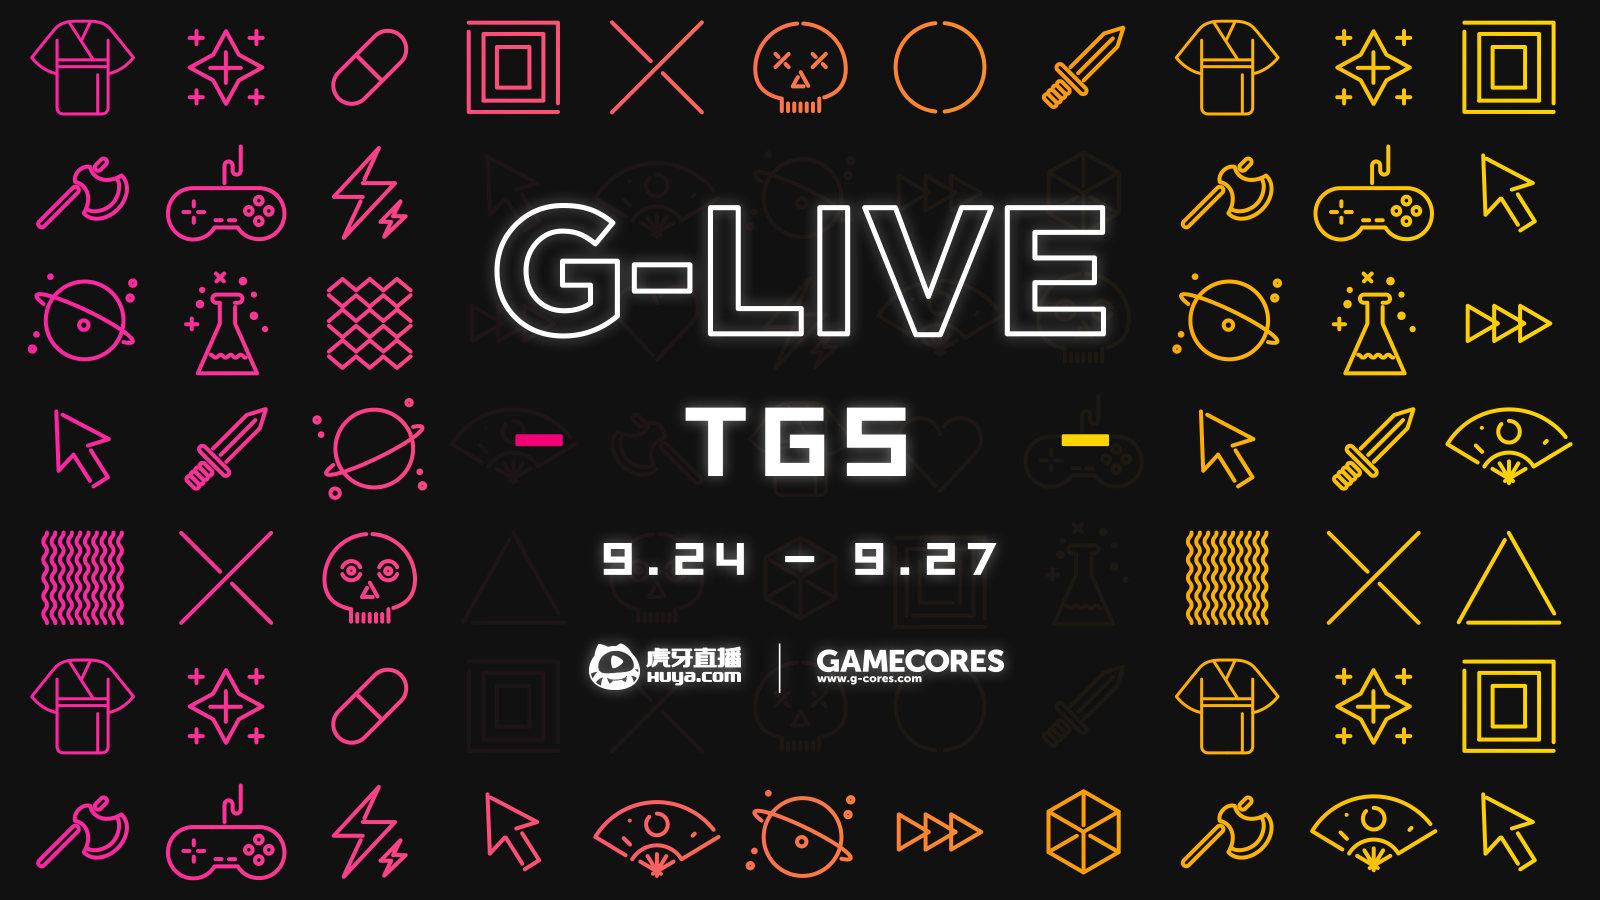 「Glive」今晚是Xbox、SE、雷霆游戏,机核陪您一起看TGS 2020!